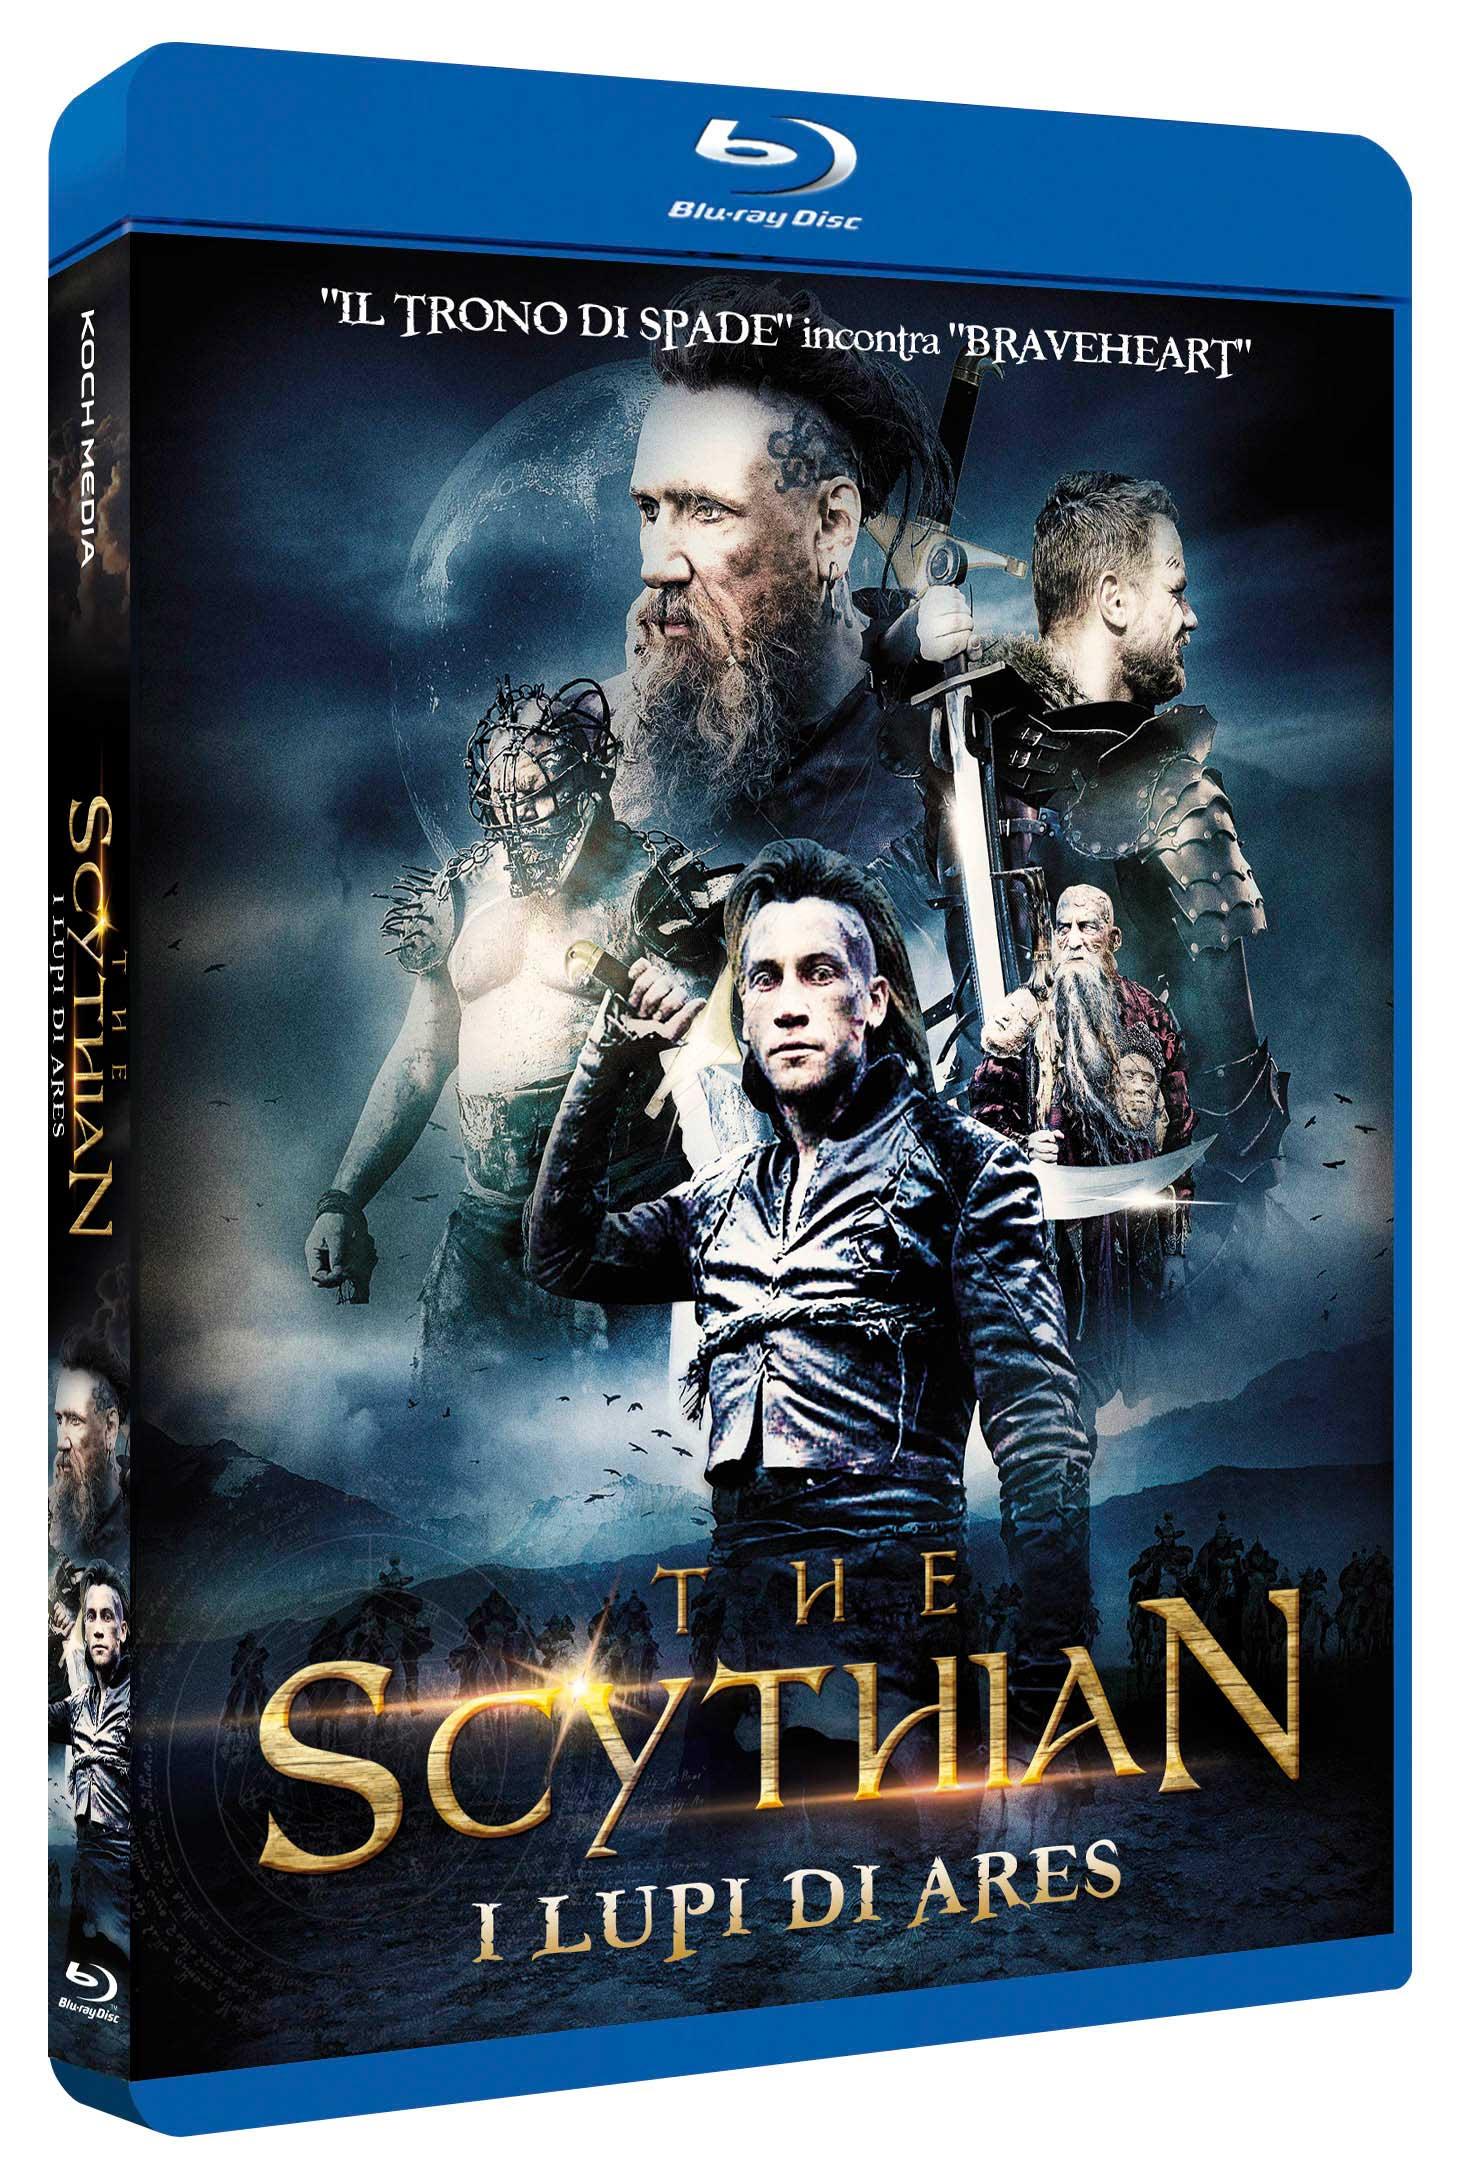 THE SCYTHIAN - I LUPI DI ARES - BLU RAY